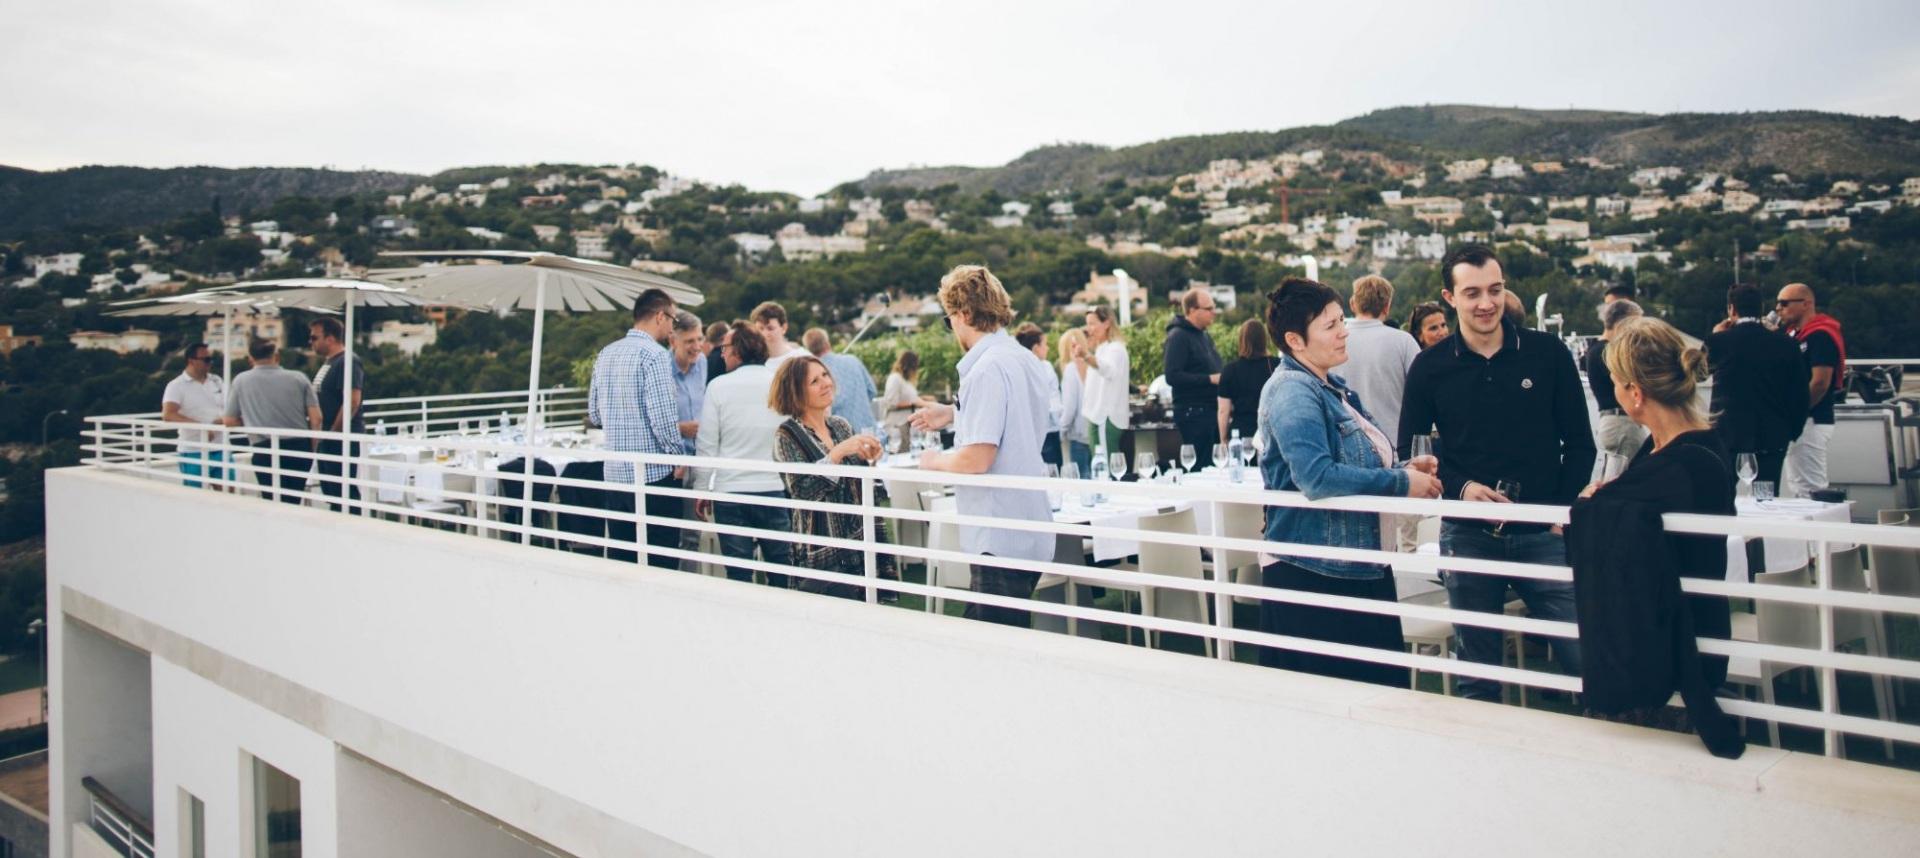 onOffice Sommer-Travelling auf Mallorca 2019: Impressionen